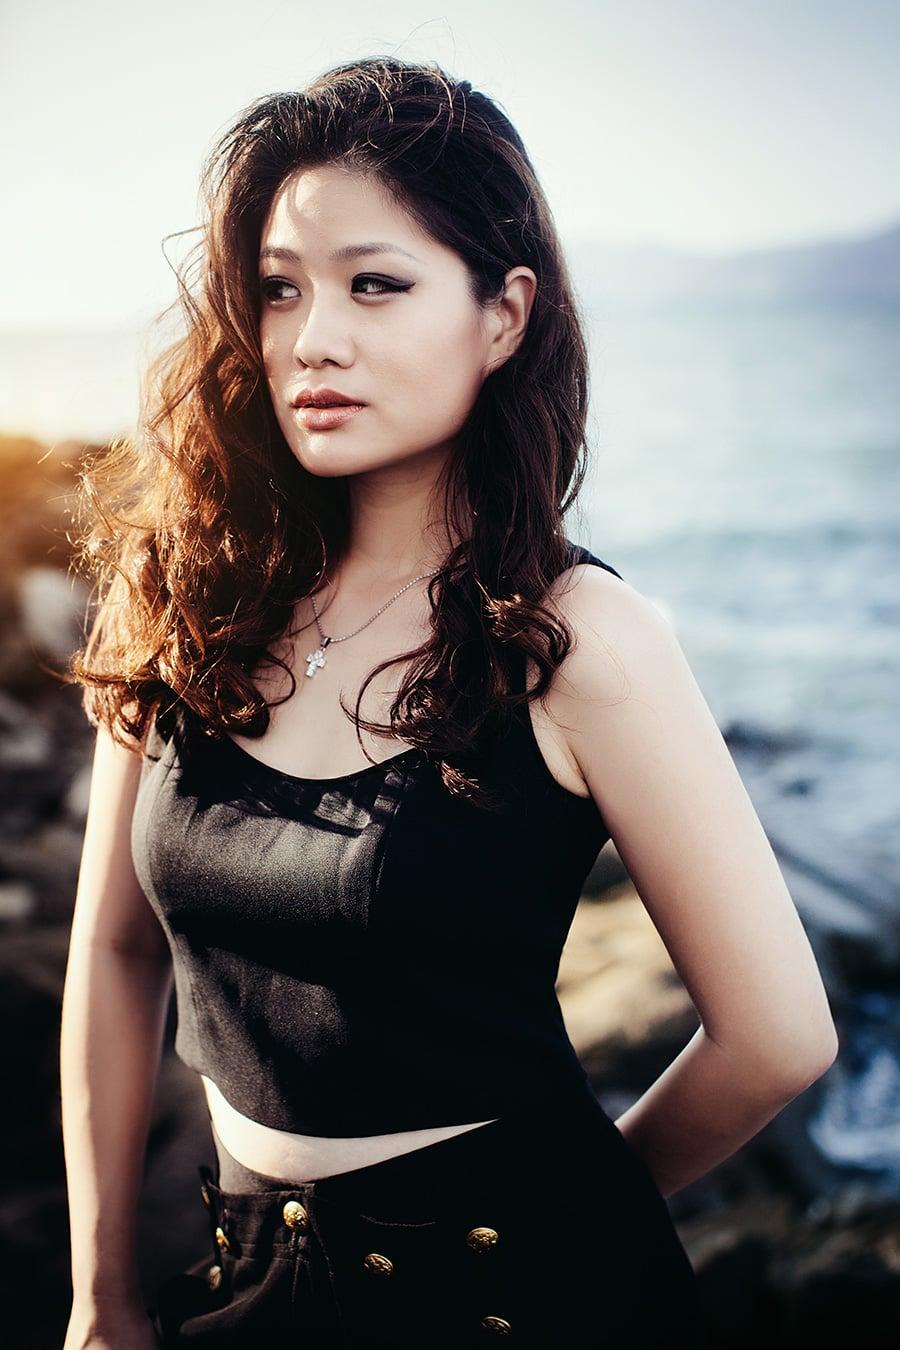 Funkydali.com - Editorial - Prestige - Malaysia - Cheryl-Quek.jpg